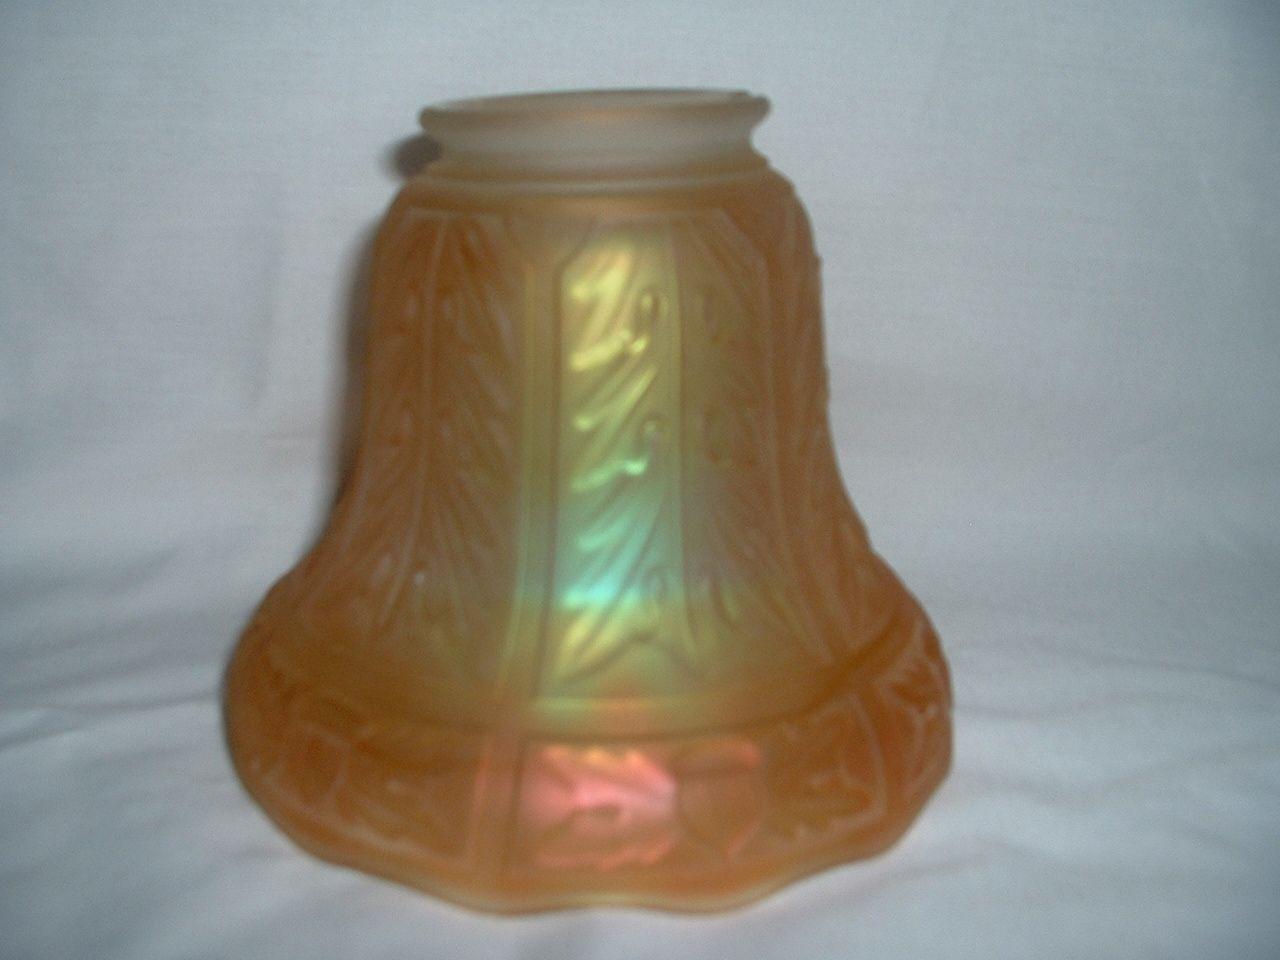 Antique glassware vintage glass shades vintage replacement glass antique glassware vintage glass shades vintage replacement glass lamp shades for your aloadofball Gallery